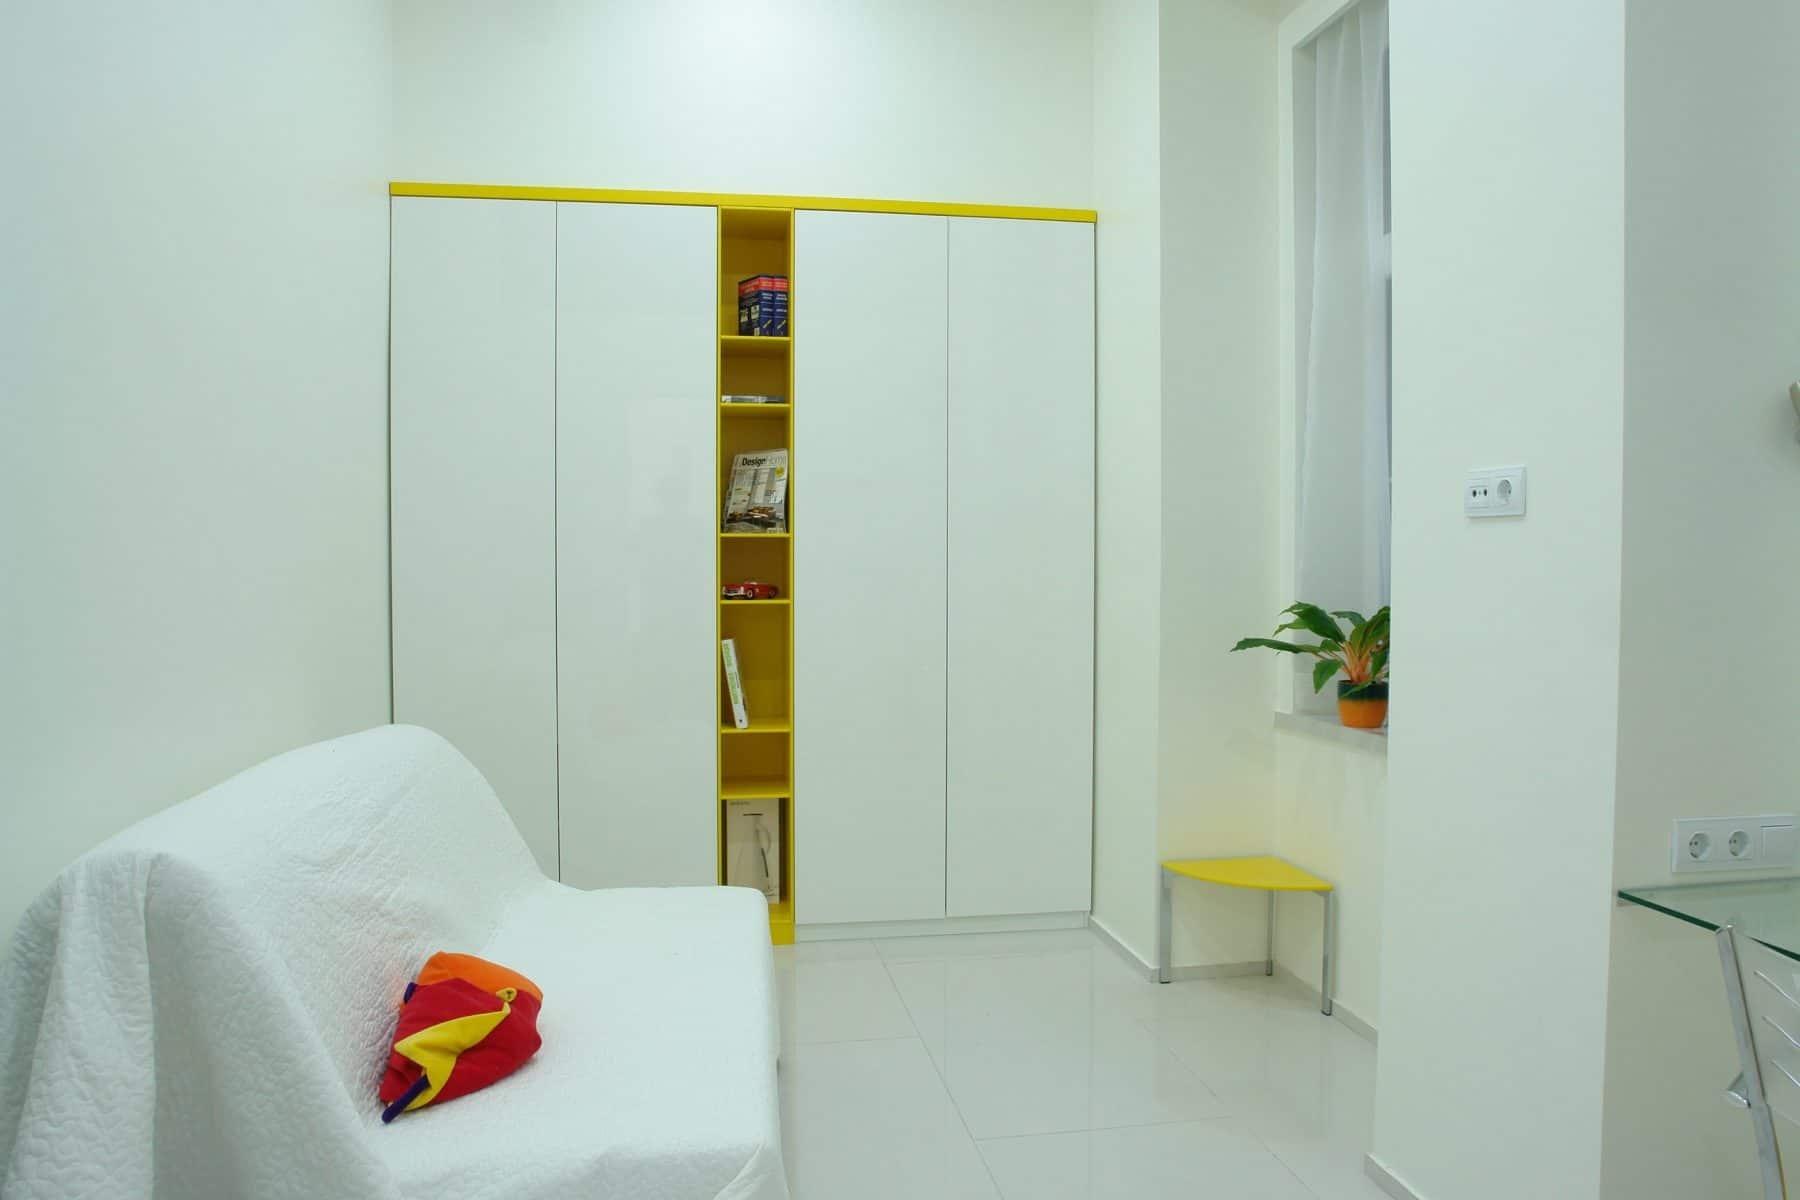 halasz-utca-modern-design-apartment-budapest-dsc06439